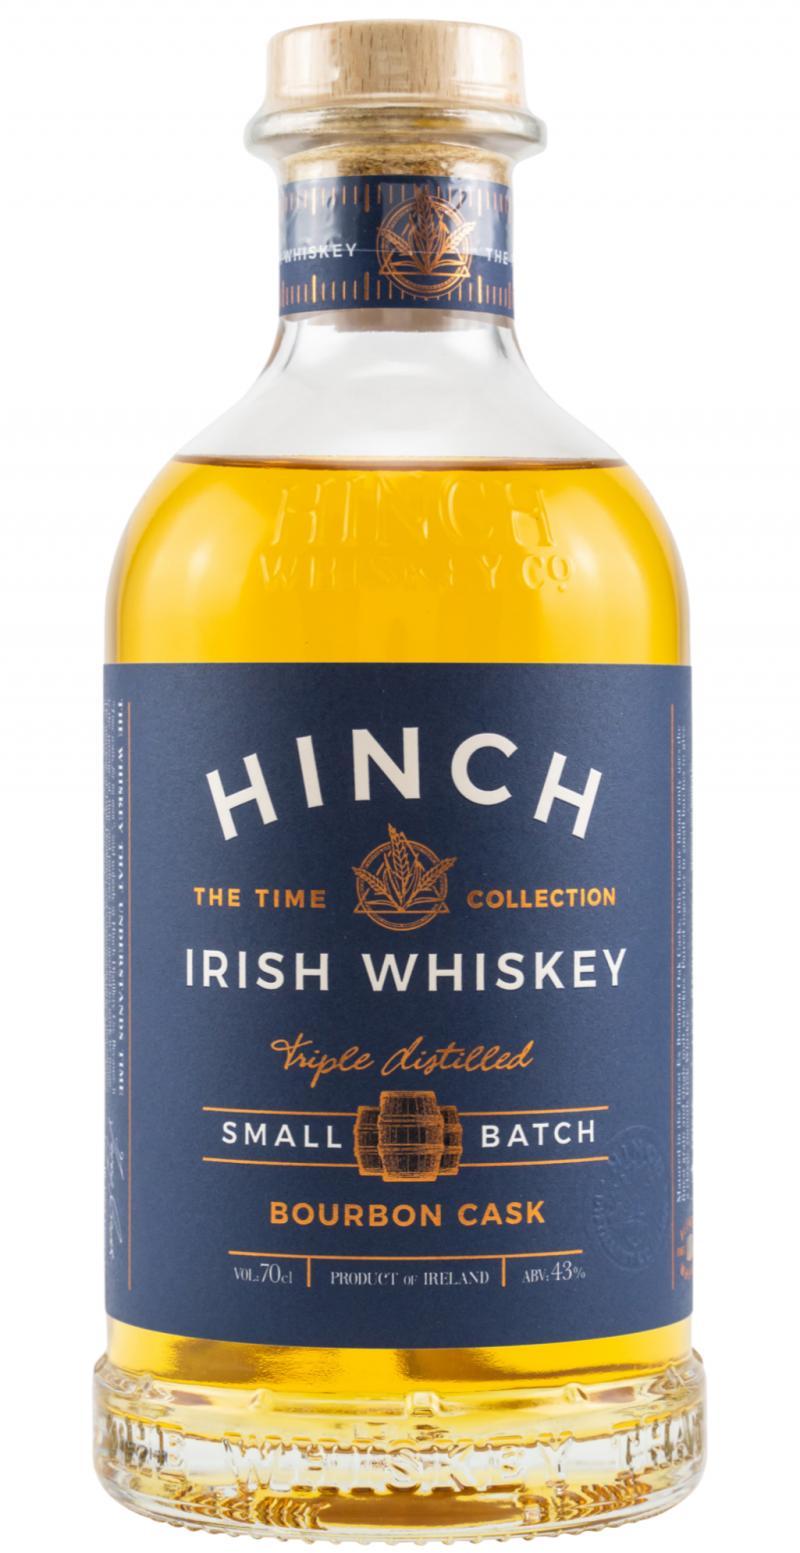 Hinch Small Batch - Irish Whiskey HDC